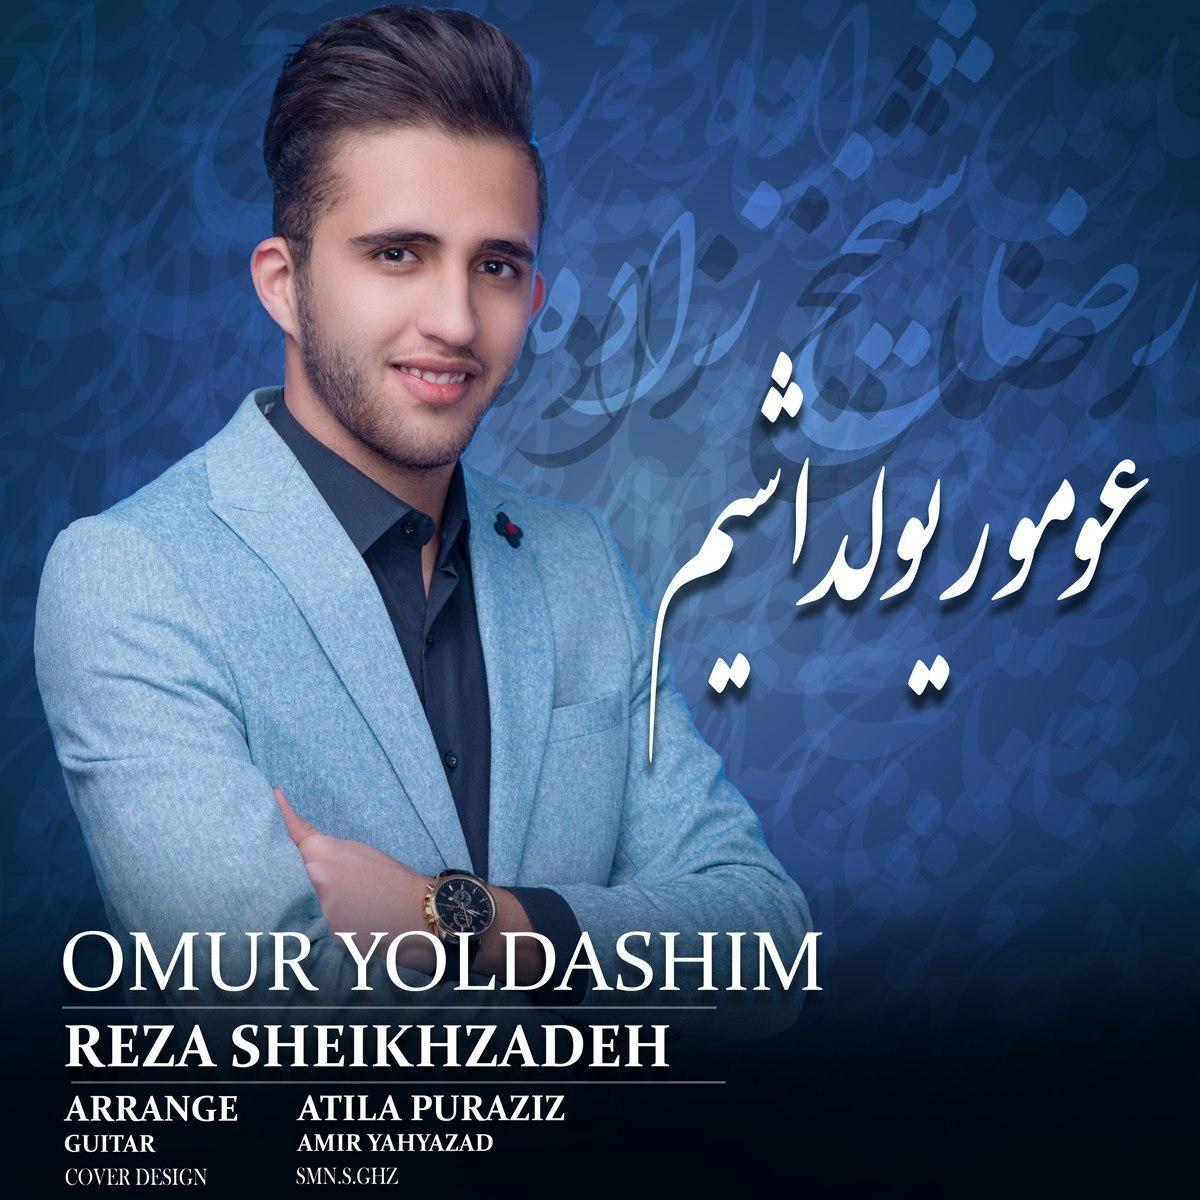 http://s4.picofile.com/file/8396783818/16Reza_Sheikhzadeh_Omur_Yoldashim.jpg